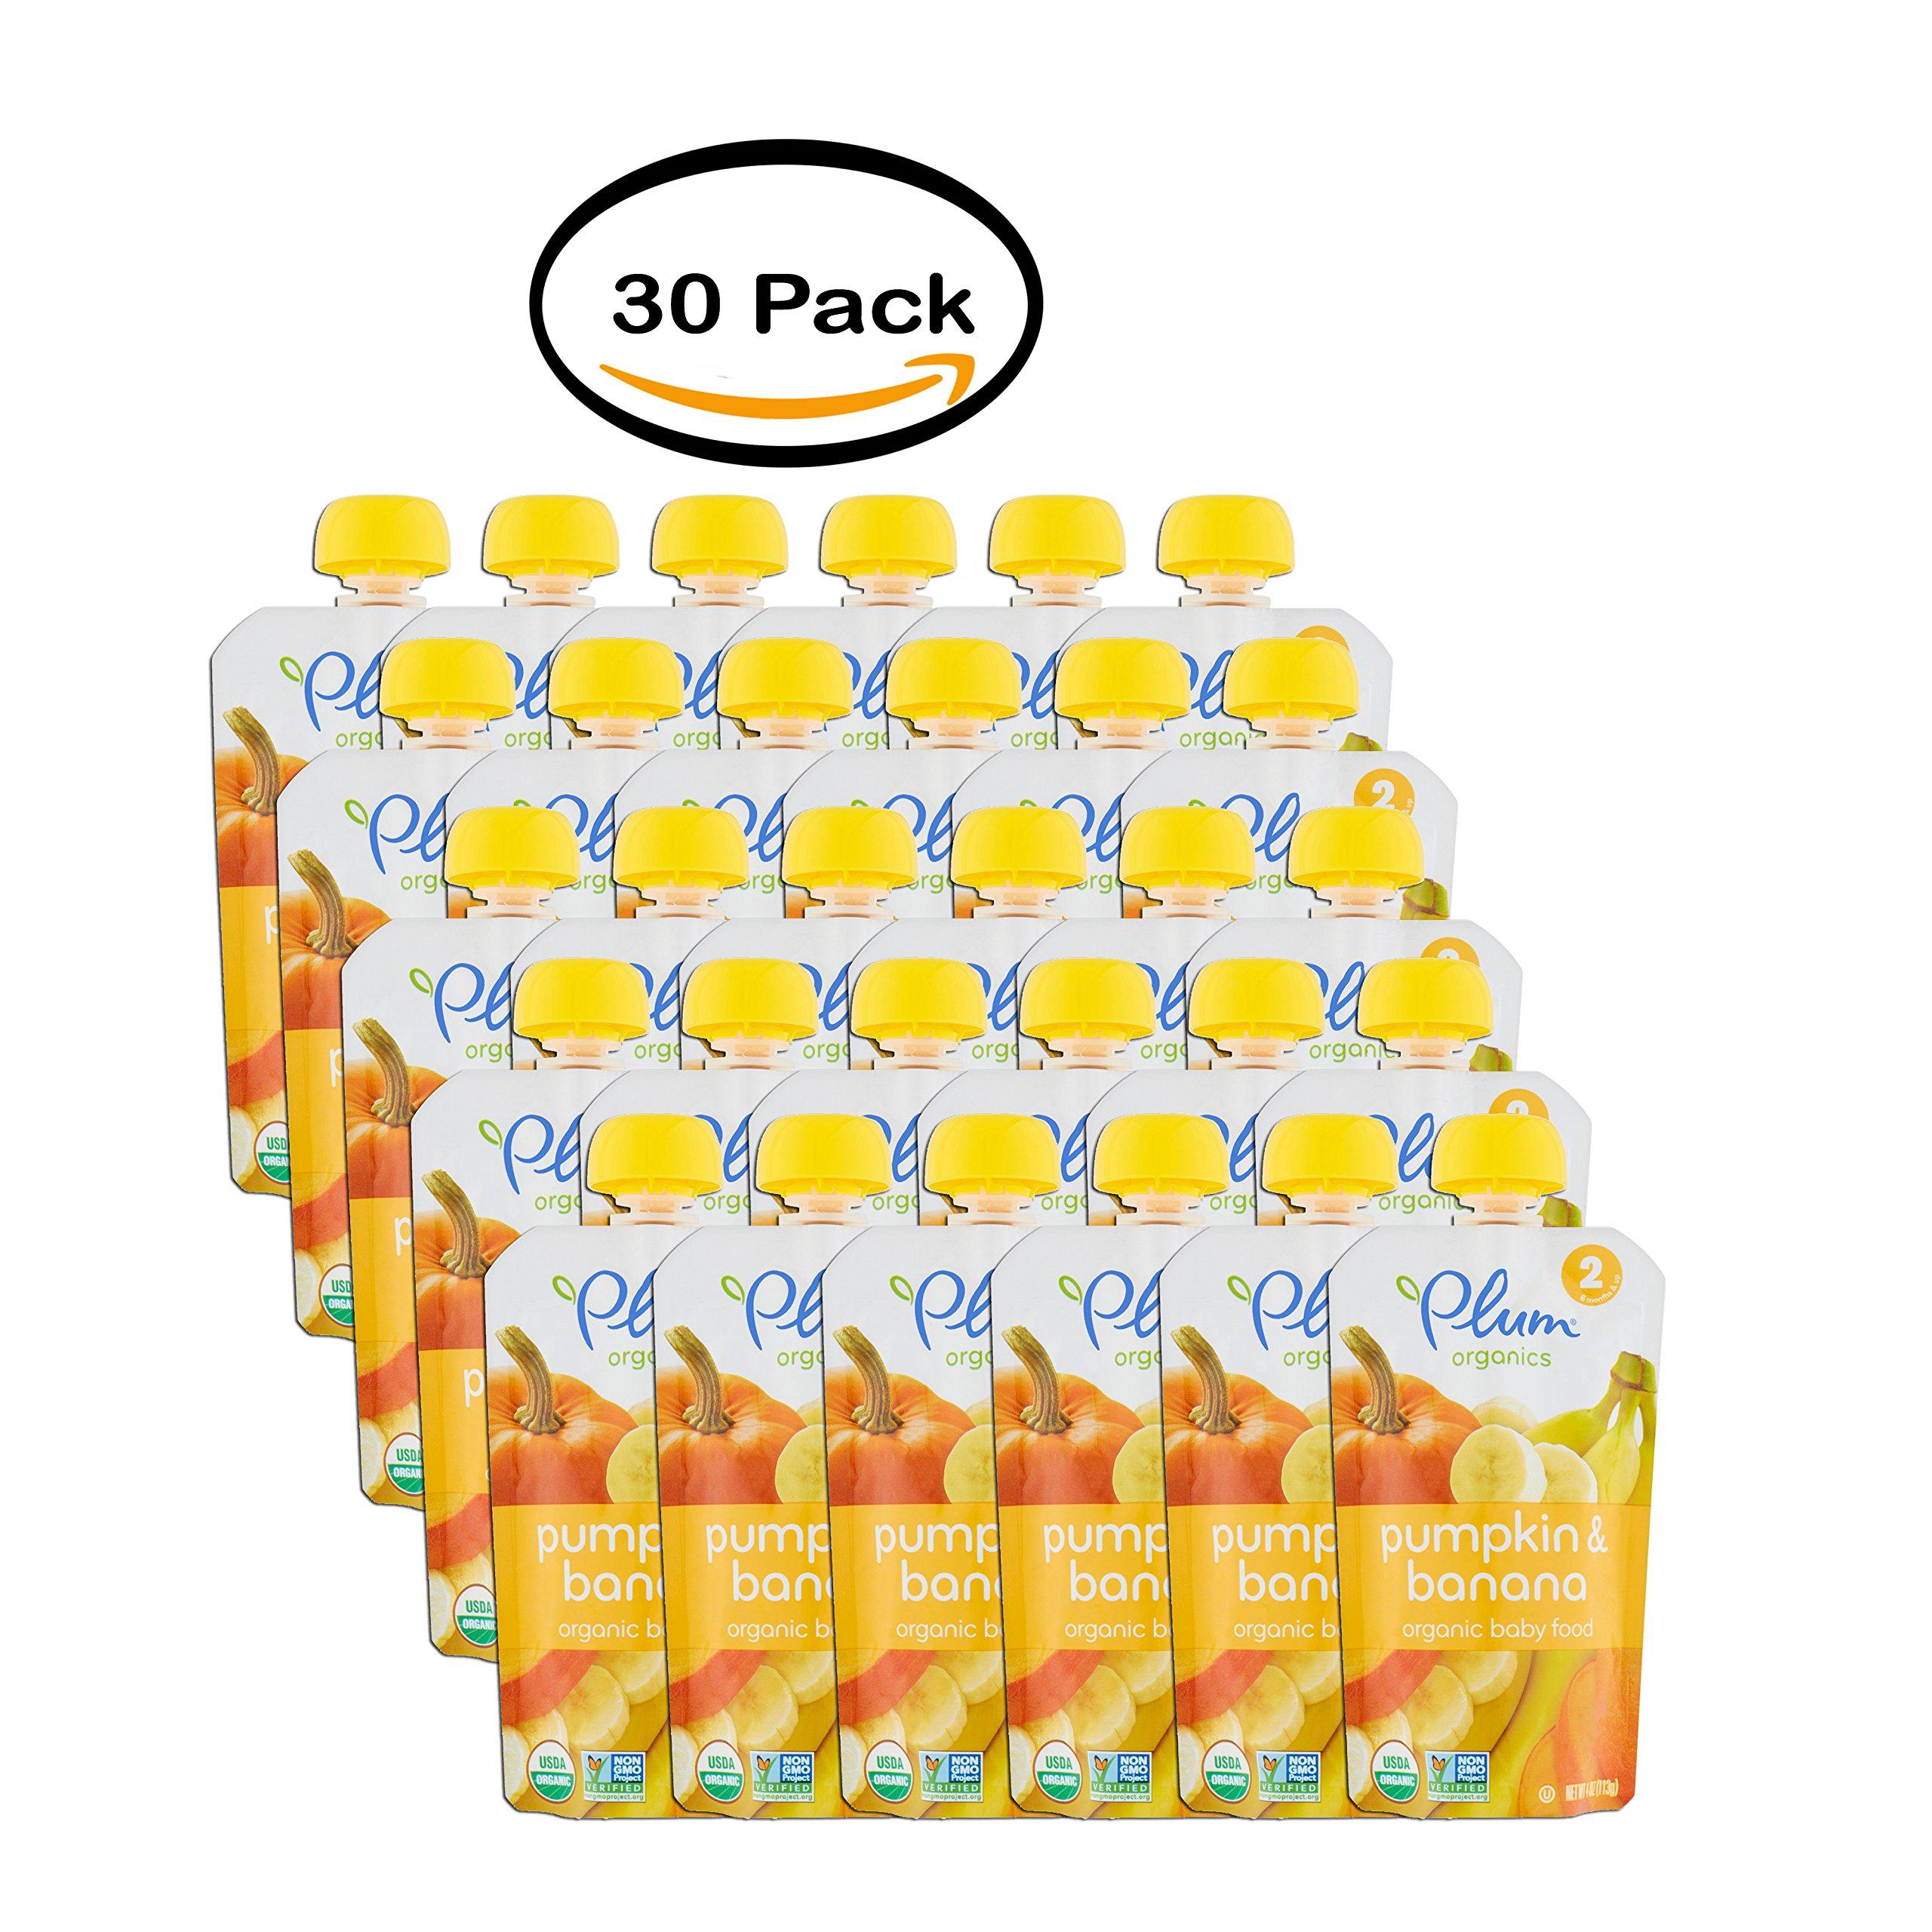 PACK OF 30 - Plum Organics Pumpkin & Banana Organic Baby Food 2 6 Months & Up 4oz